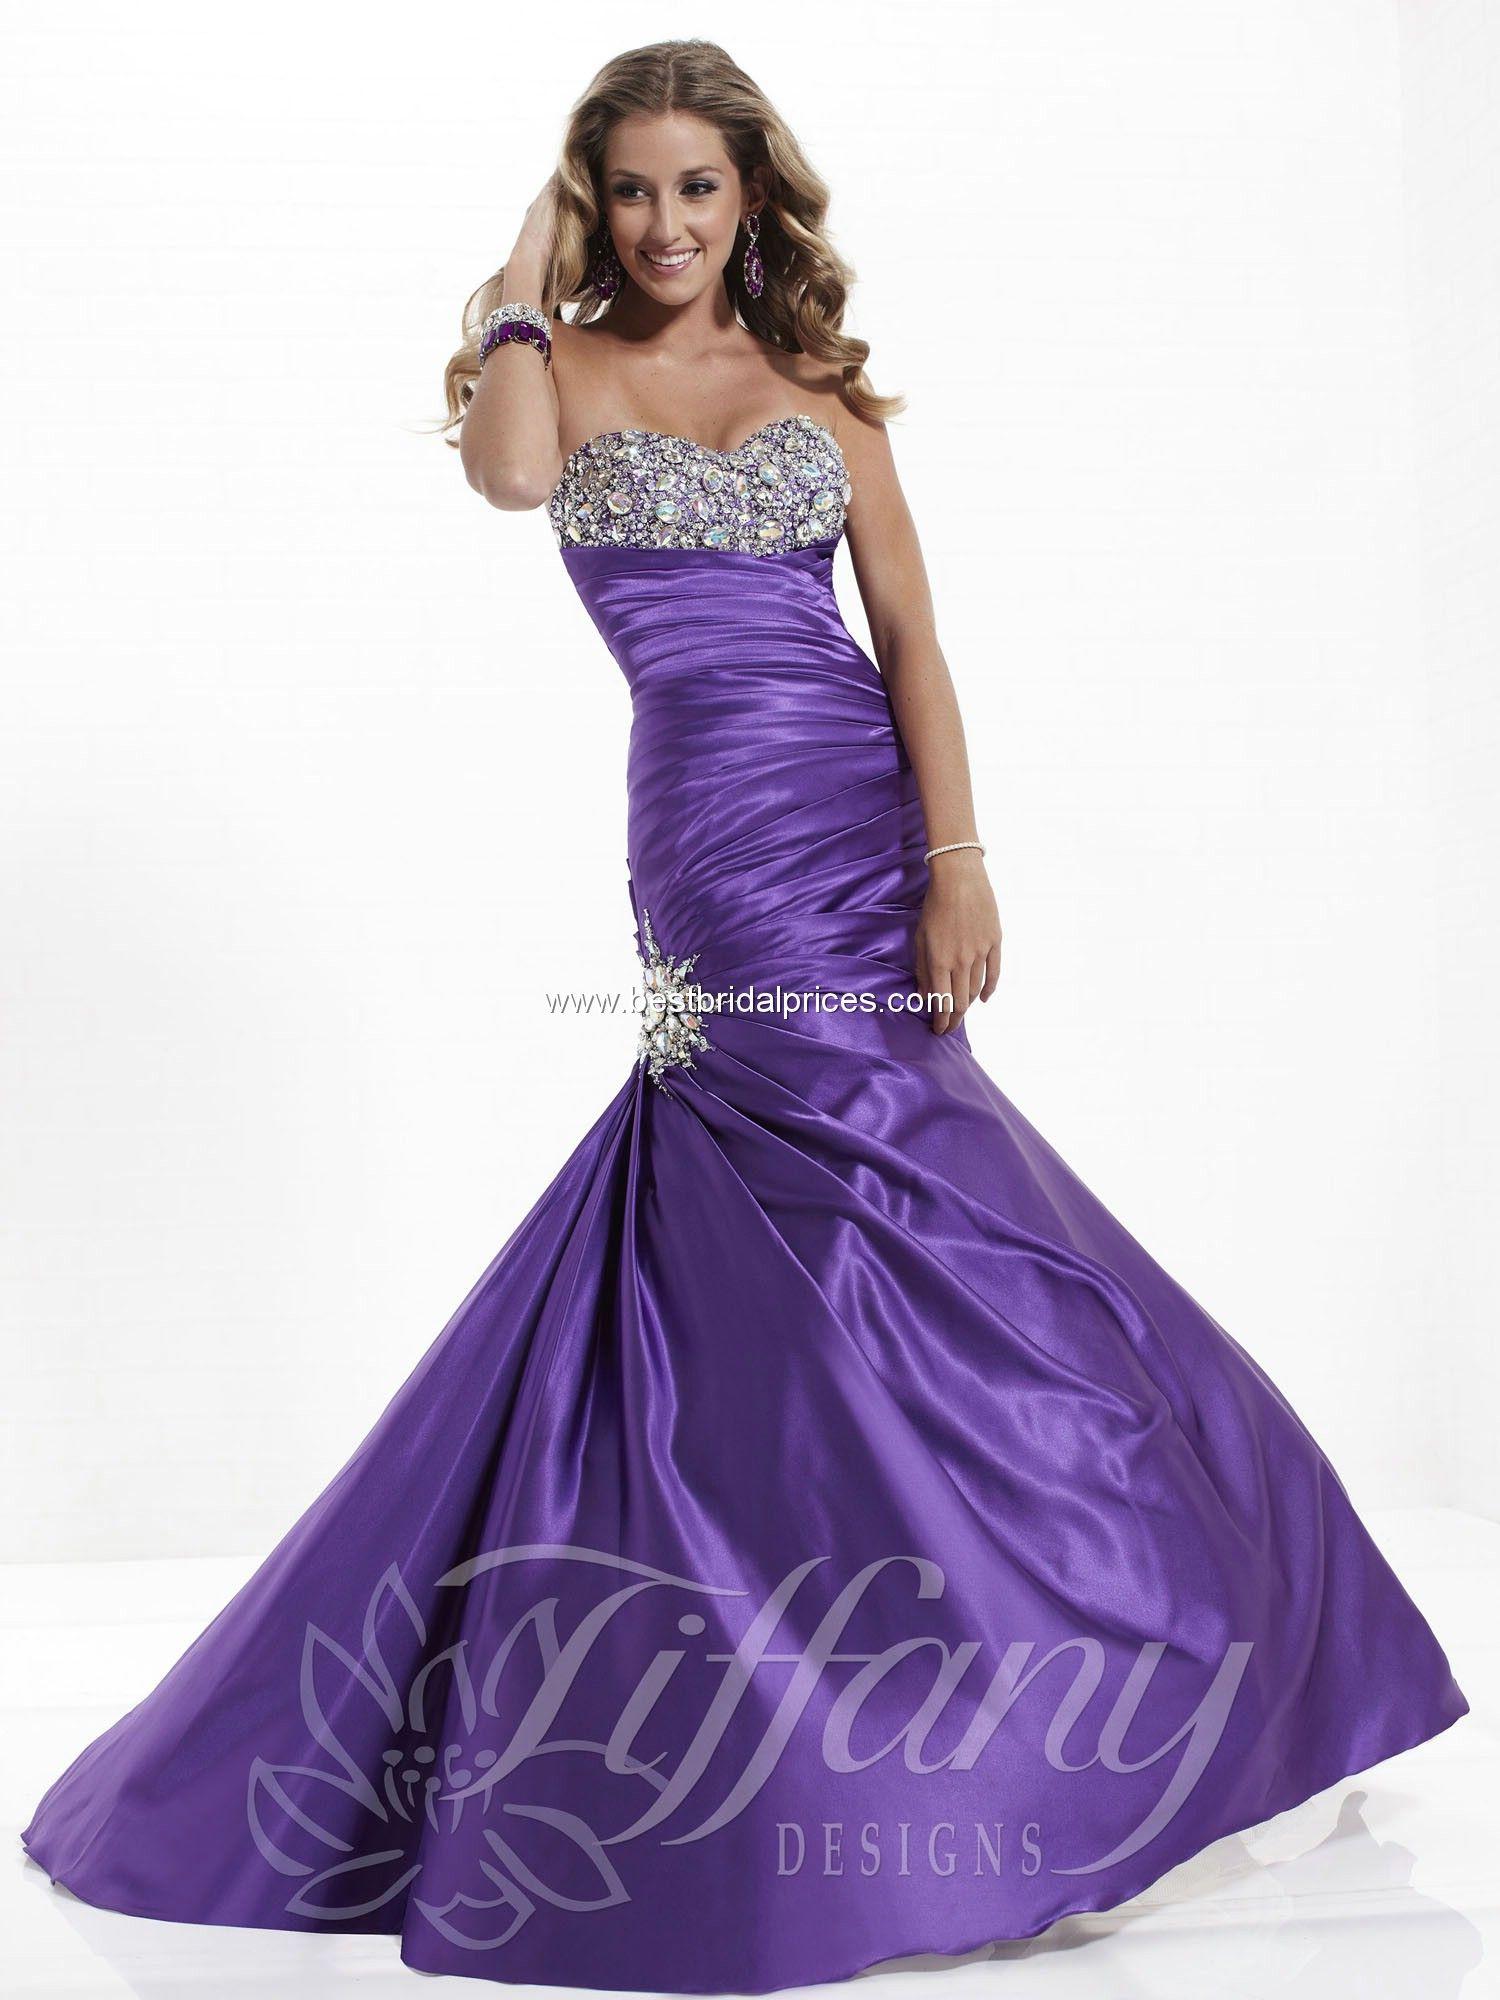 Tiffany Prom Dresses - Style 16769 | Tiffany | Pinterest